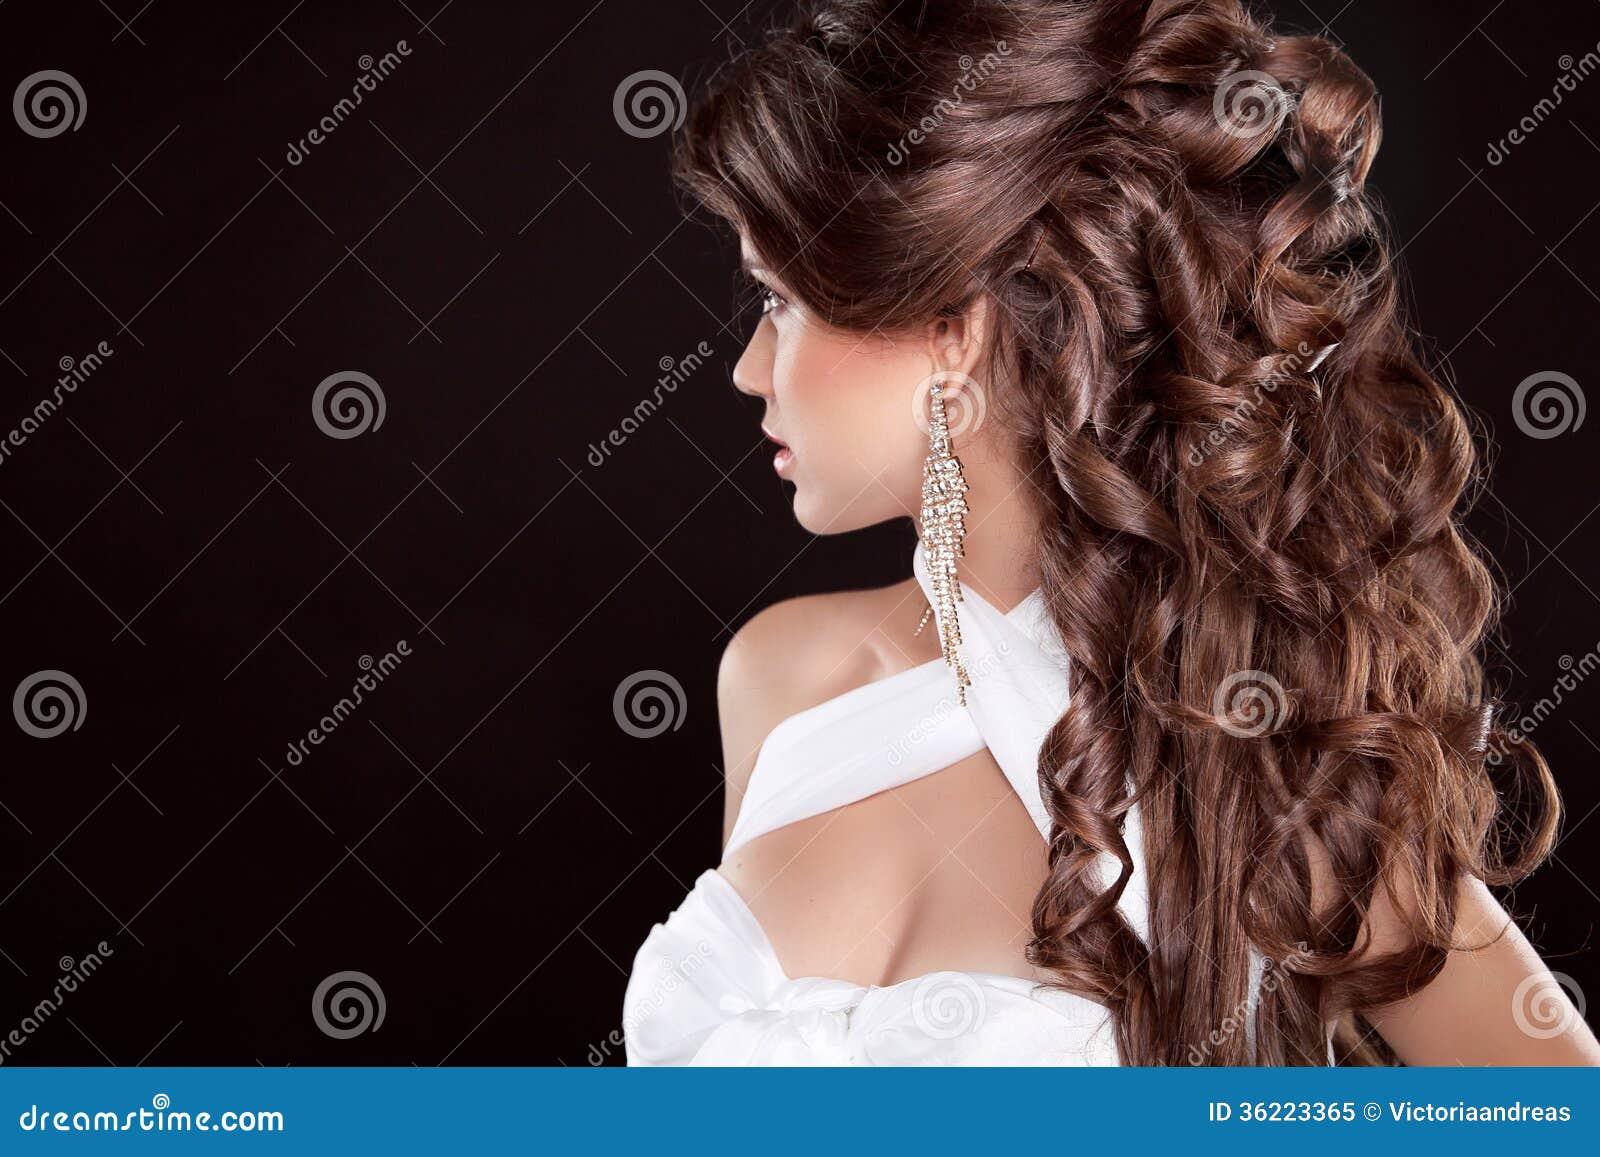 Outstanding Hairstyle Long Hair Glamour Fashion Woman Portrait Of Beautifu Short Hairstyles Gunalazisus